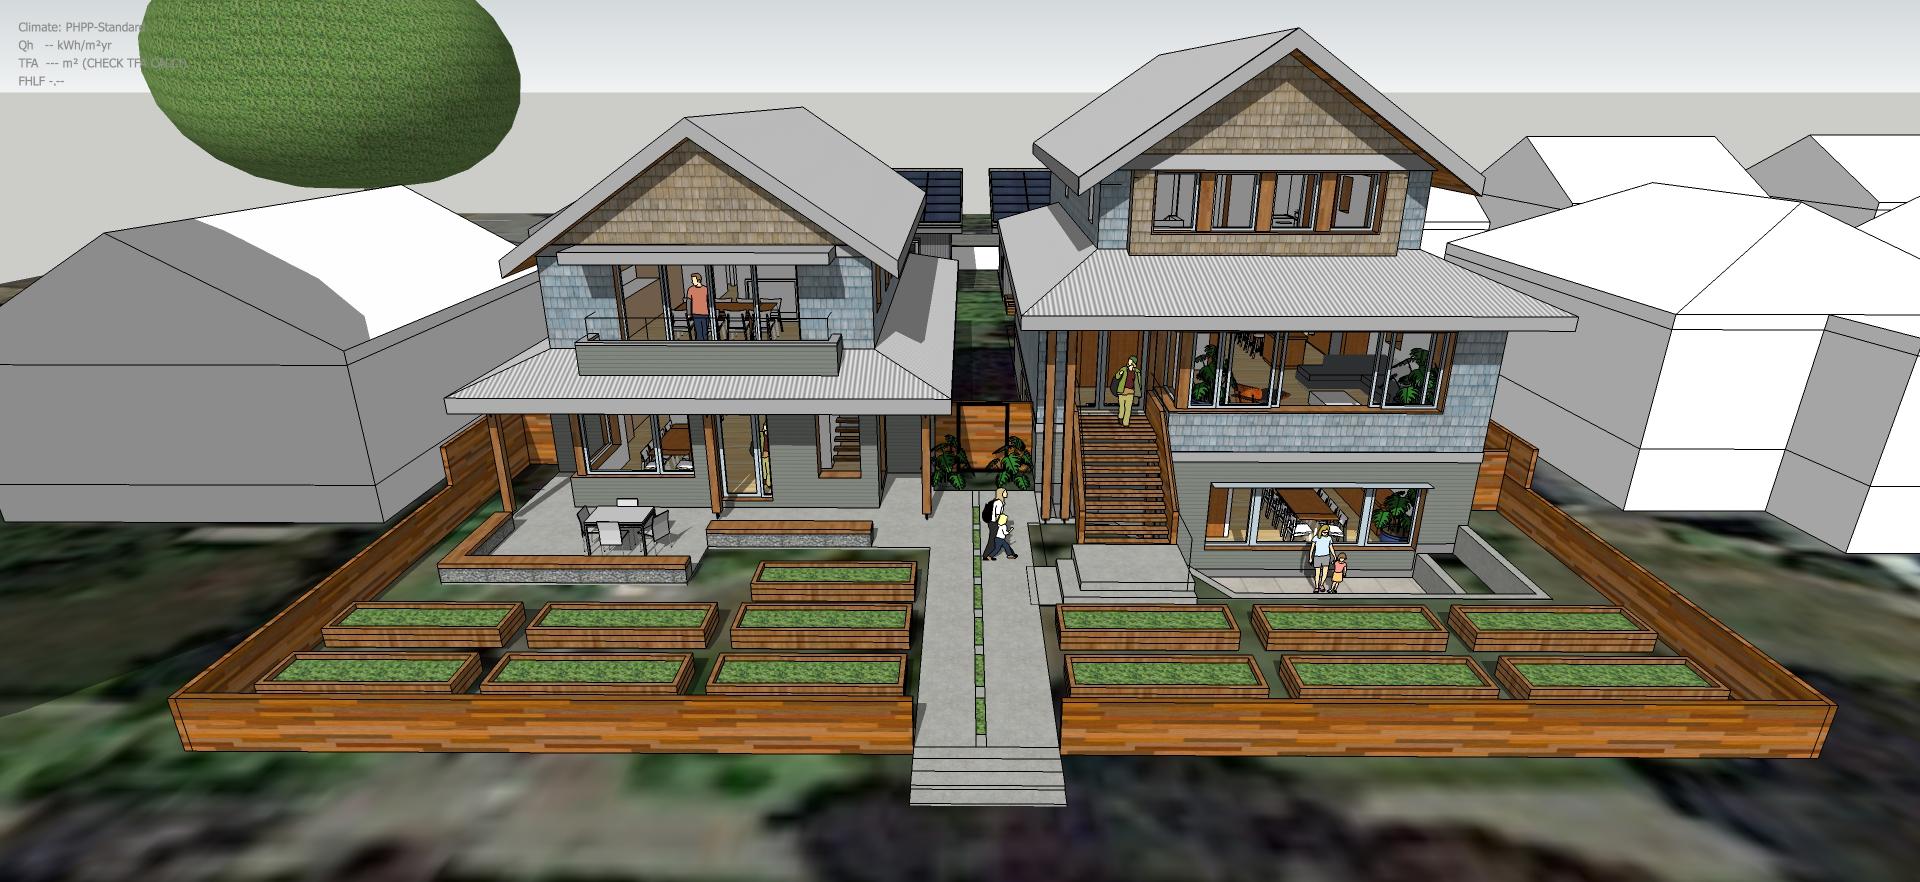 lanefab-turner-st.-passive-houses